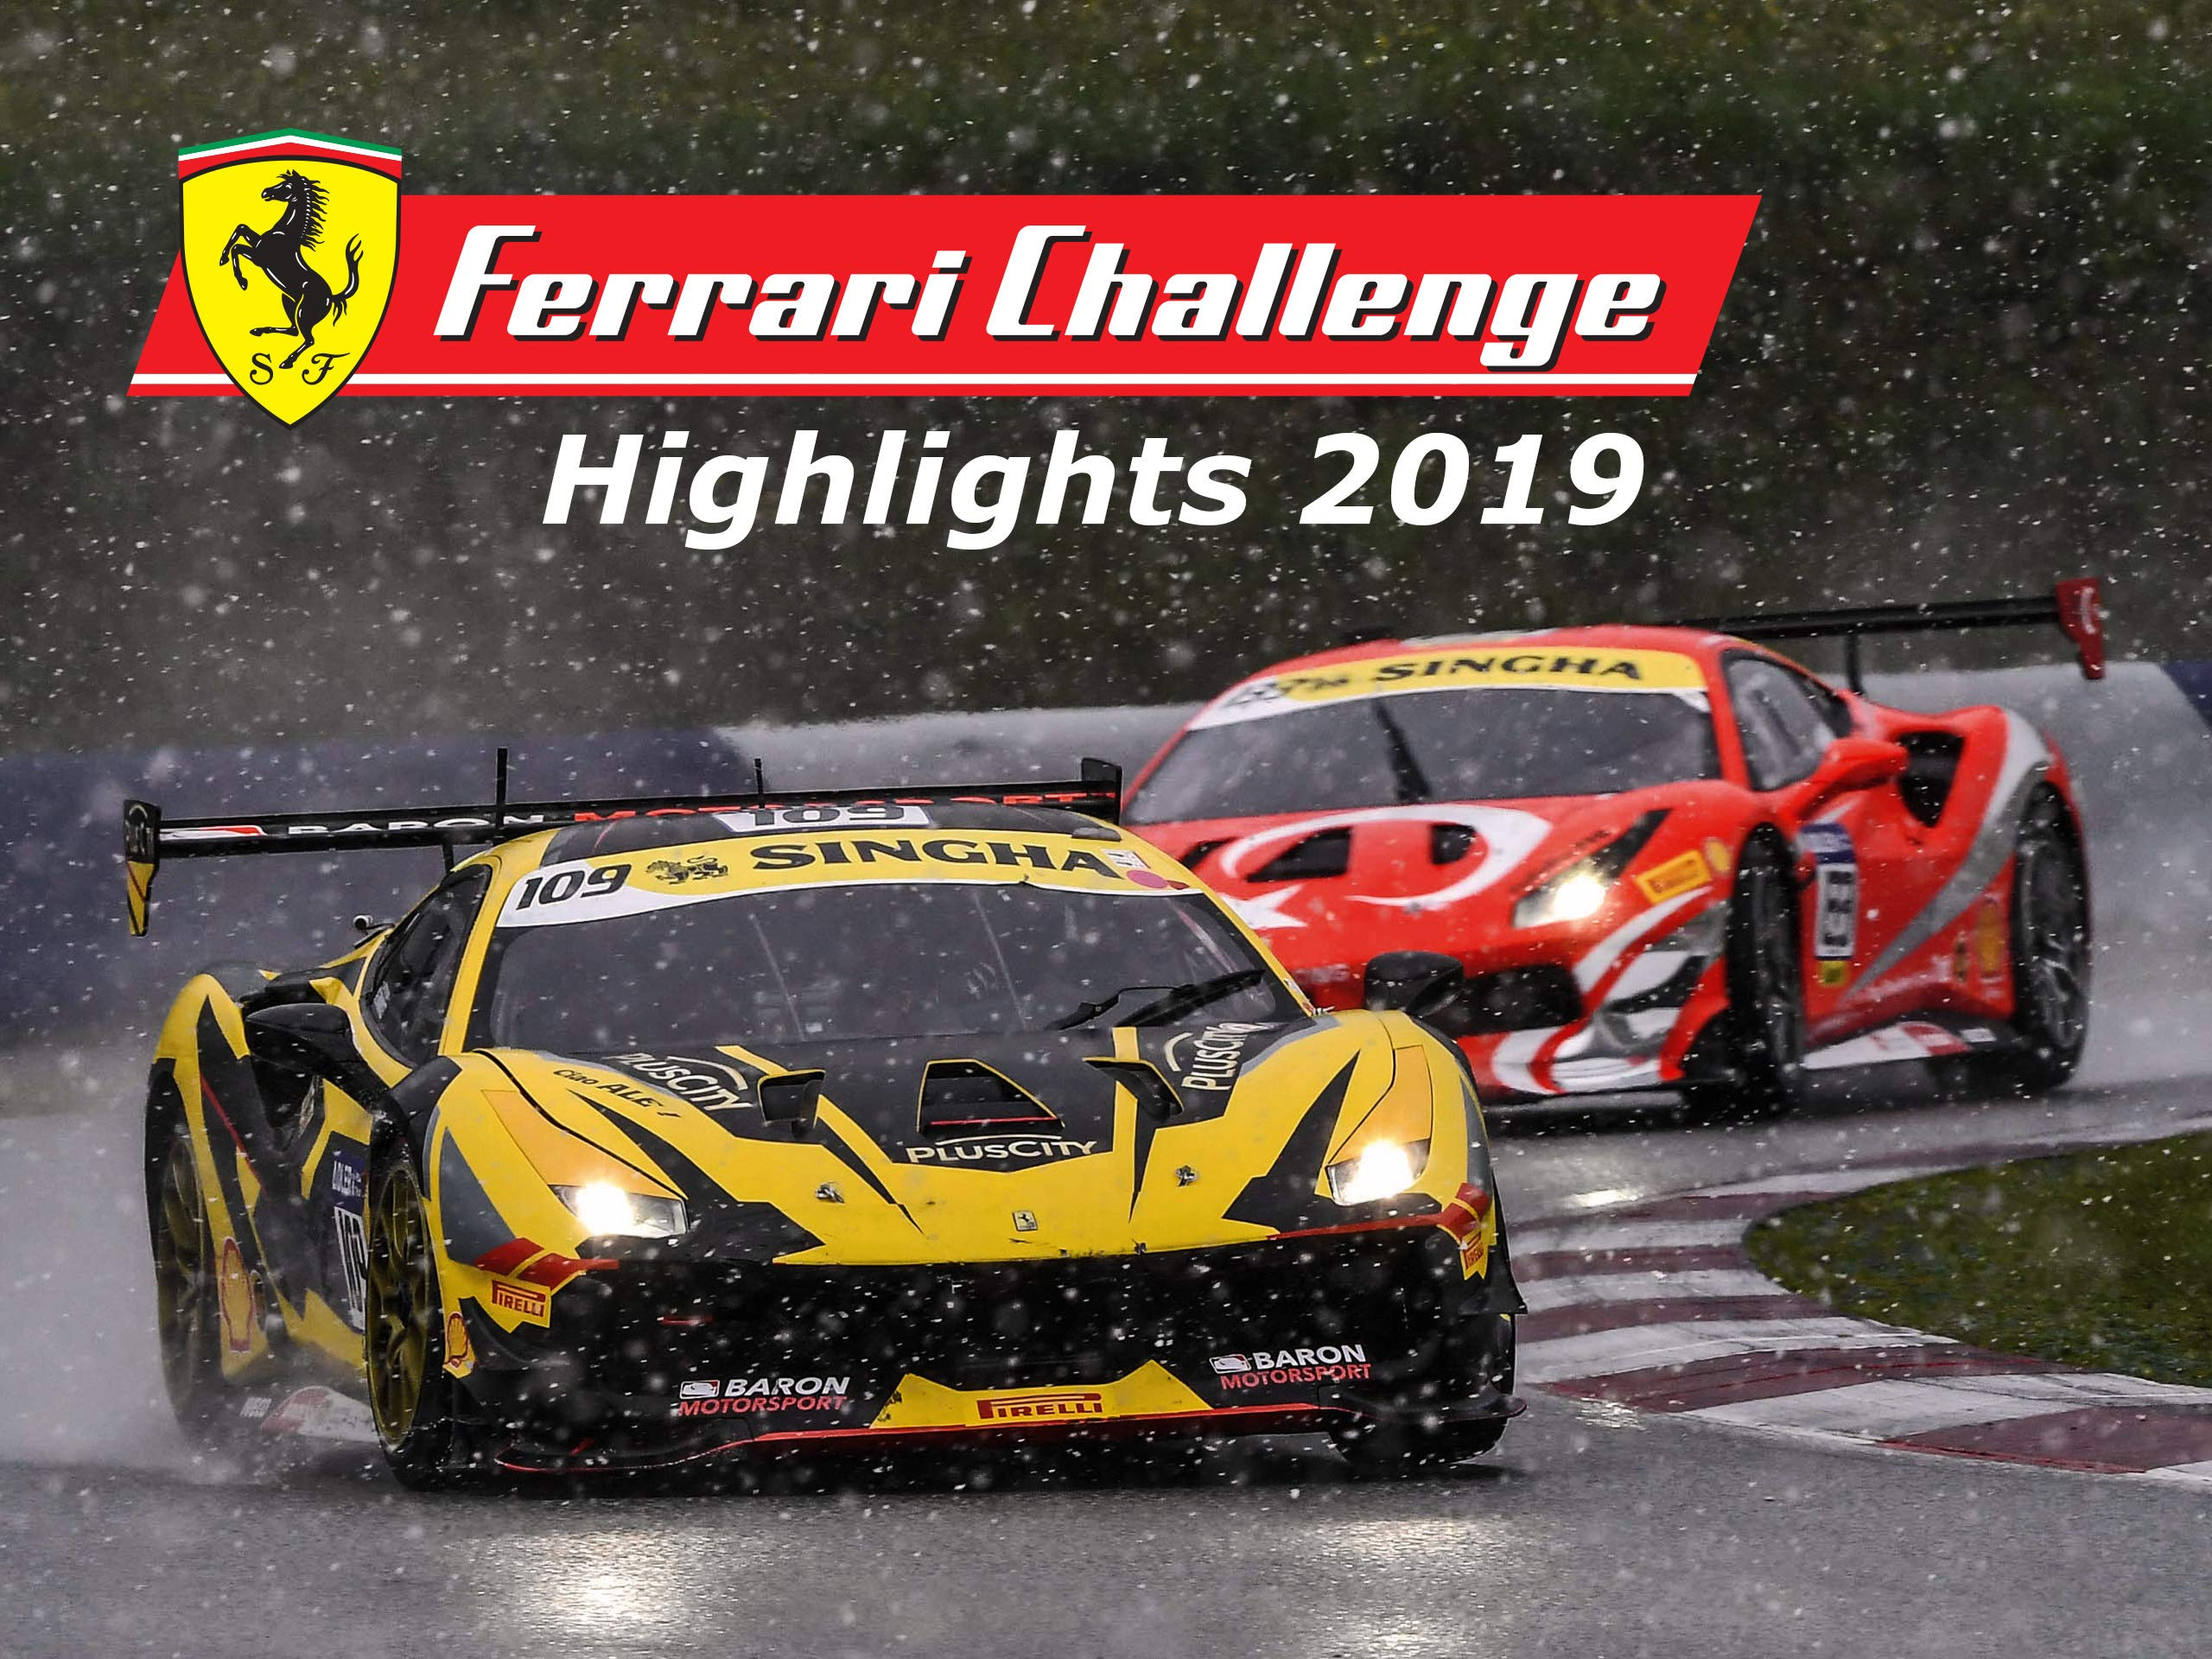 Ferrari Challenge Europe - Highlights 2019 on Amazon Prime Video UK